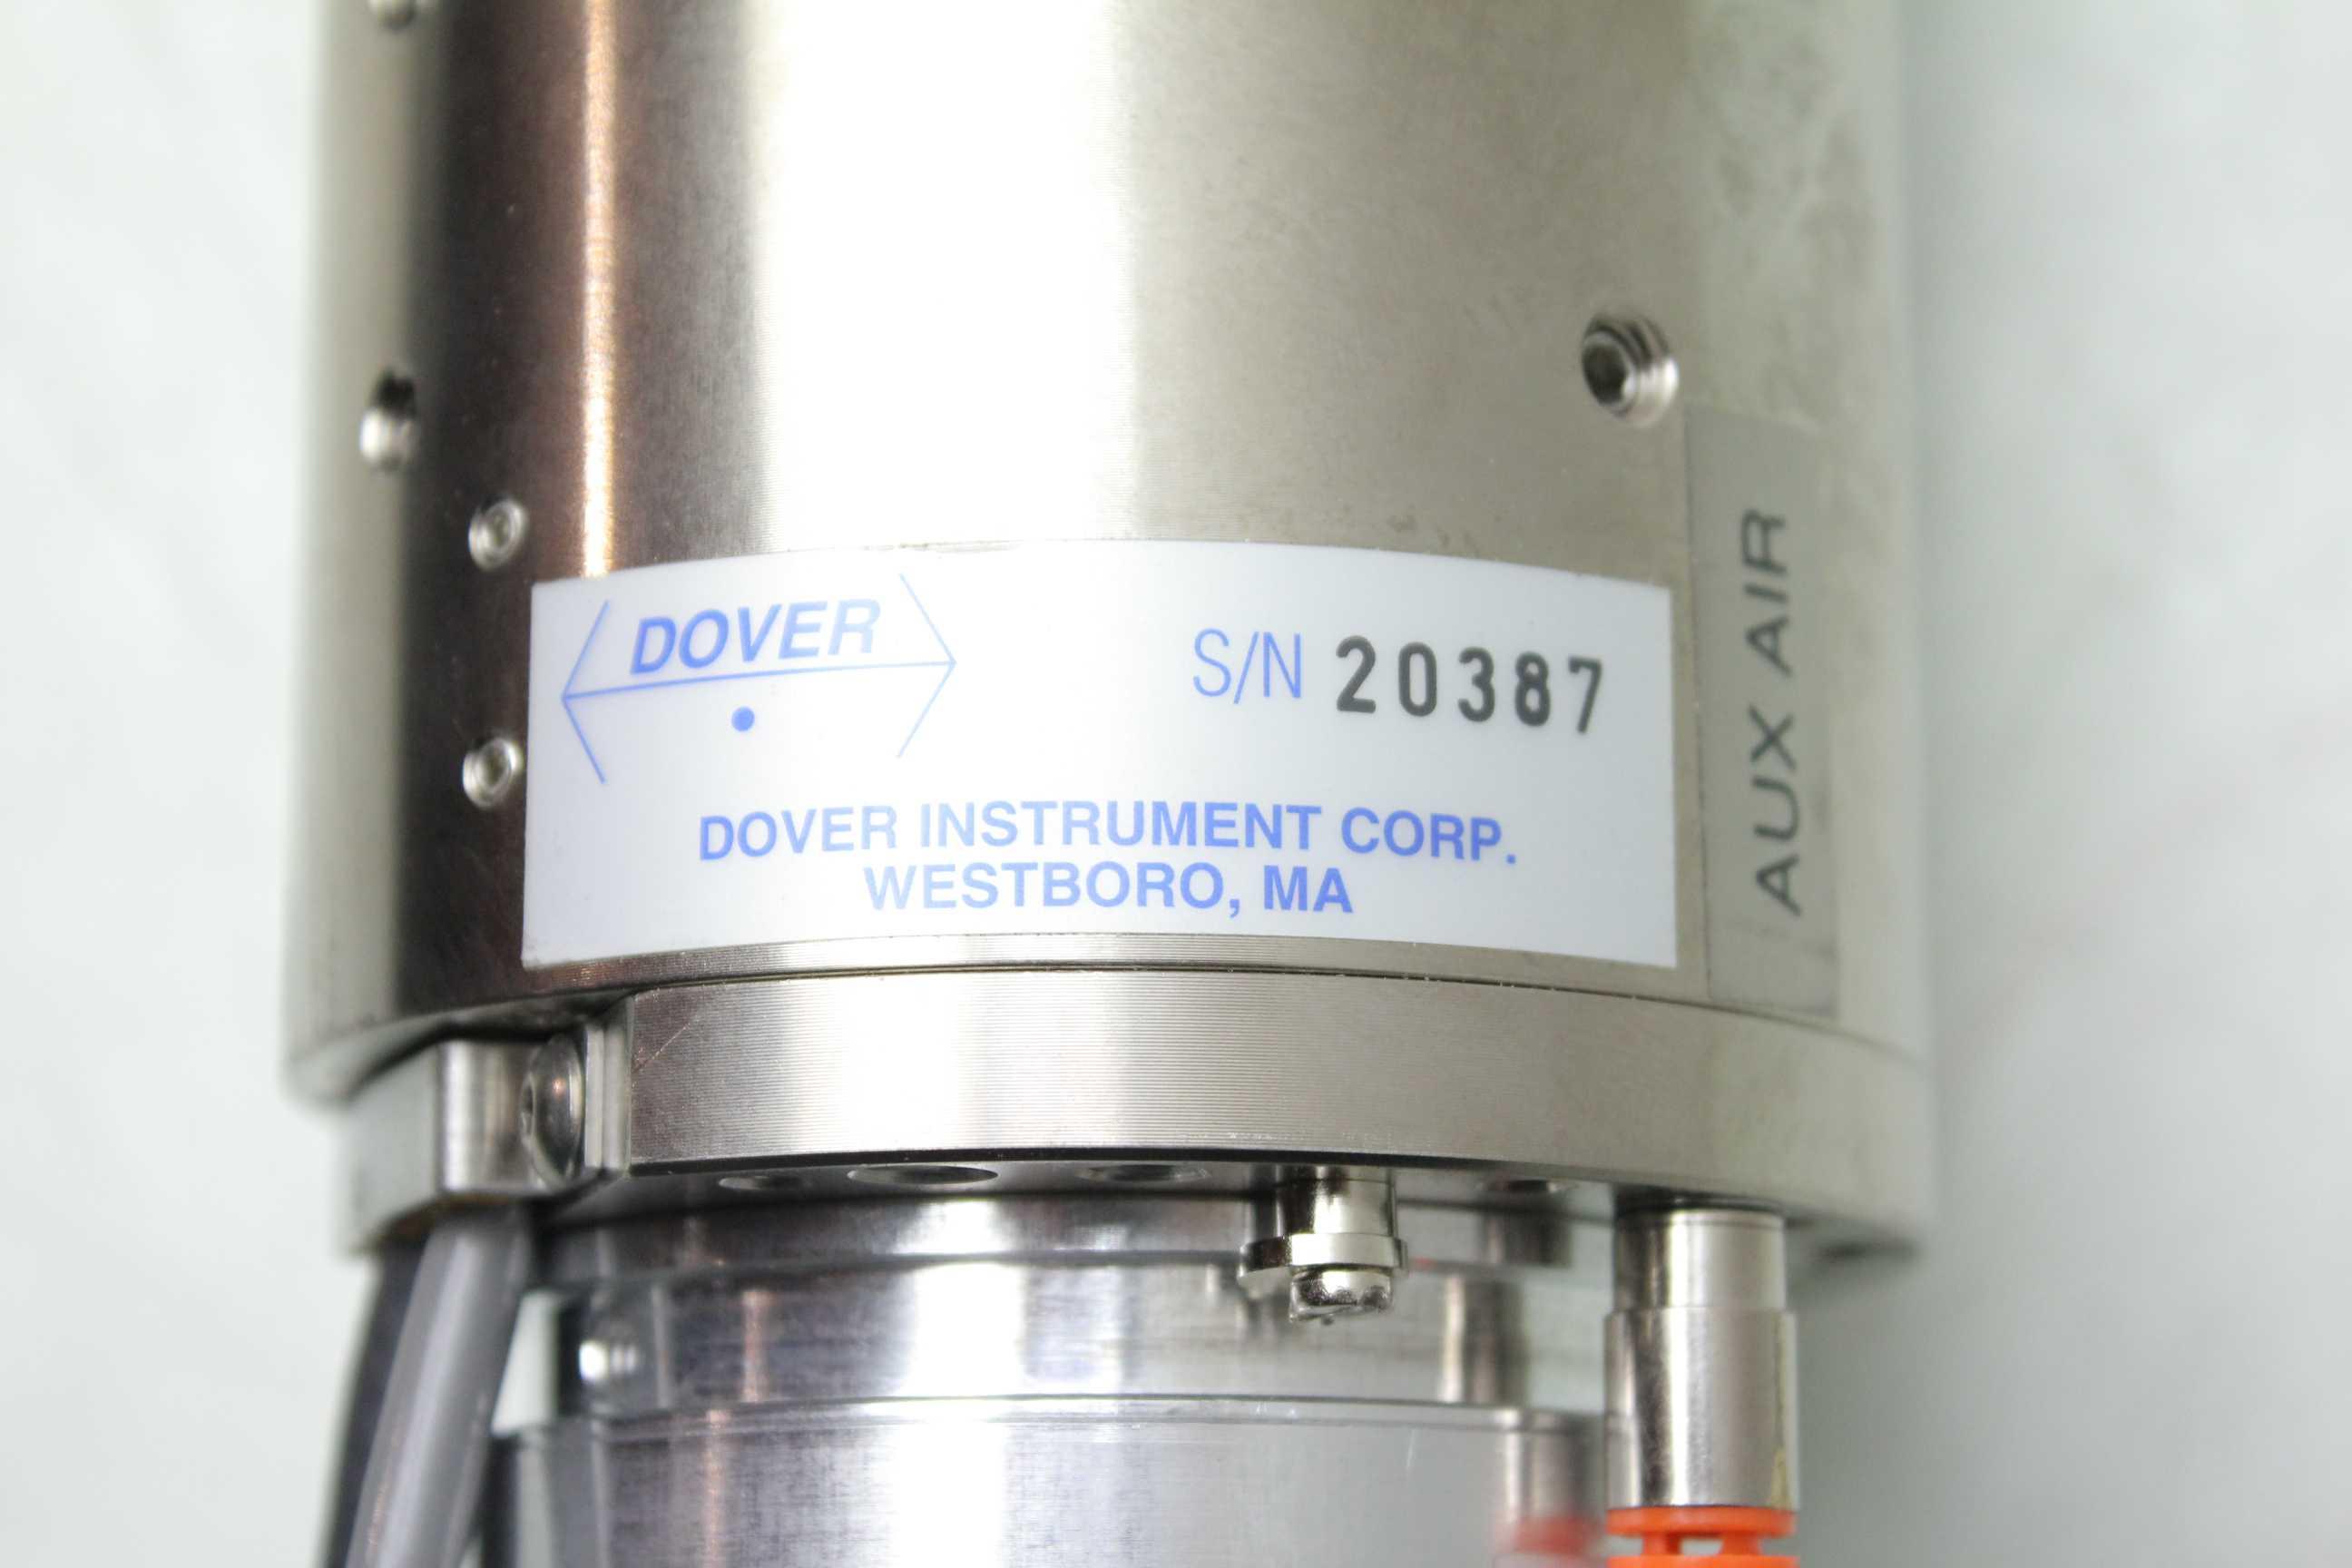 kubler encoder wiring diagram warn 9 5 xp dover motion revolution xl air bearing high speed spindle